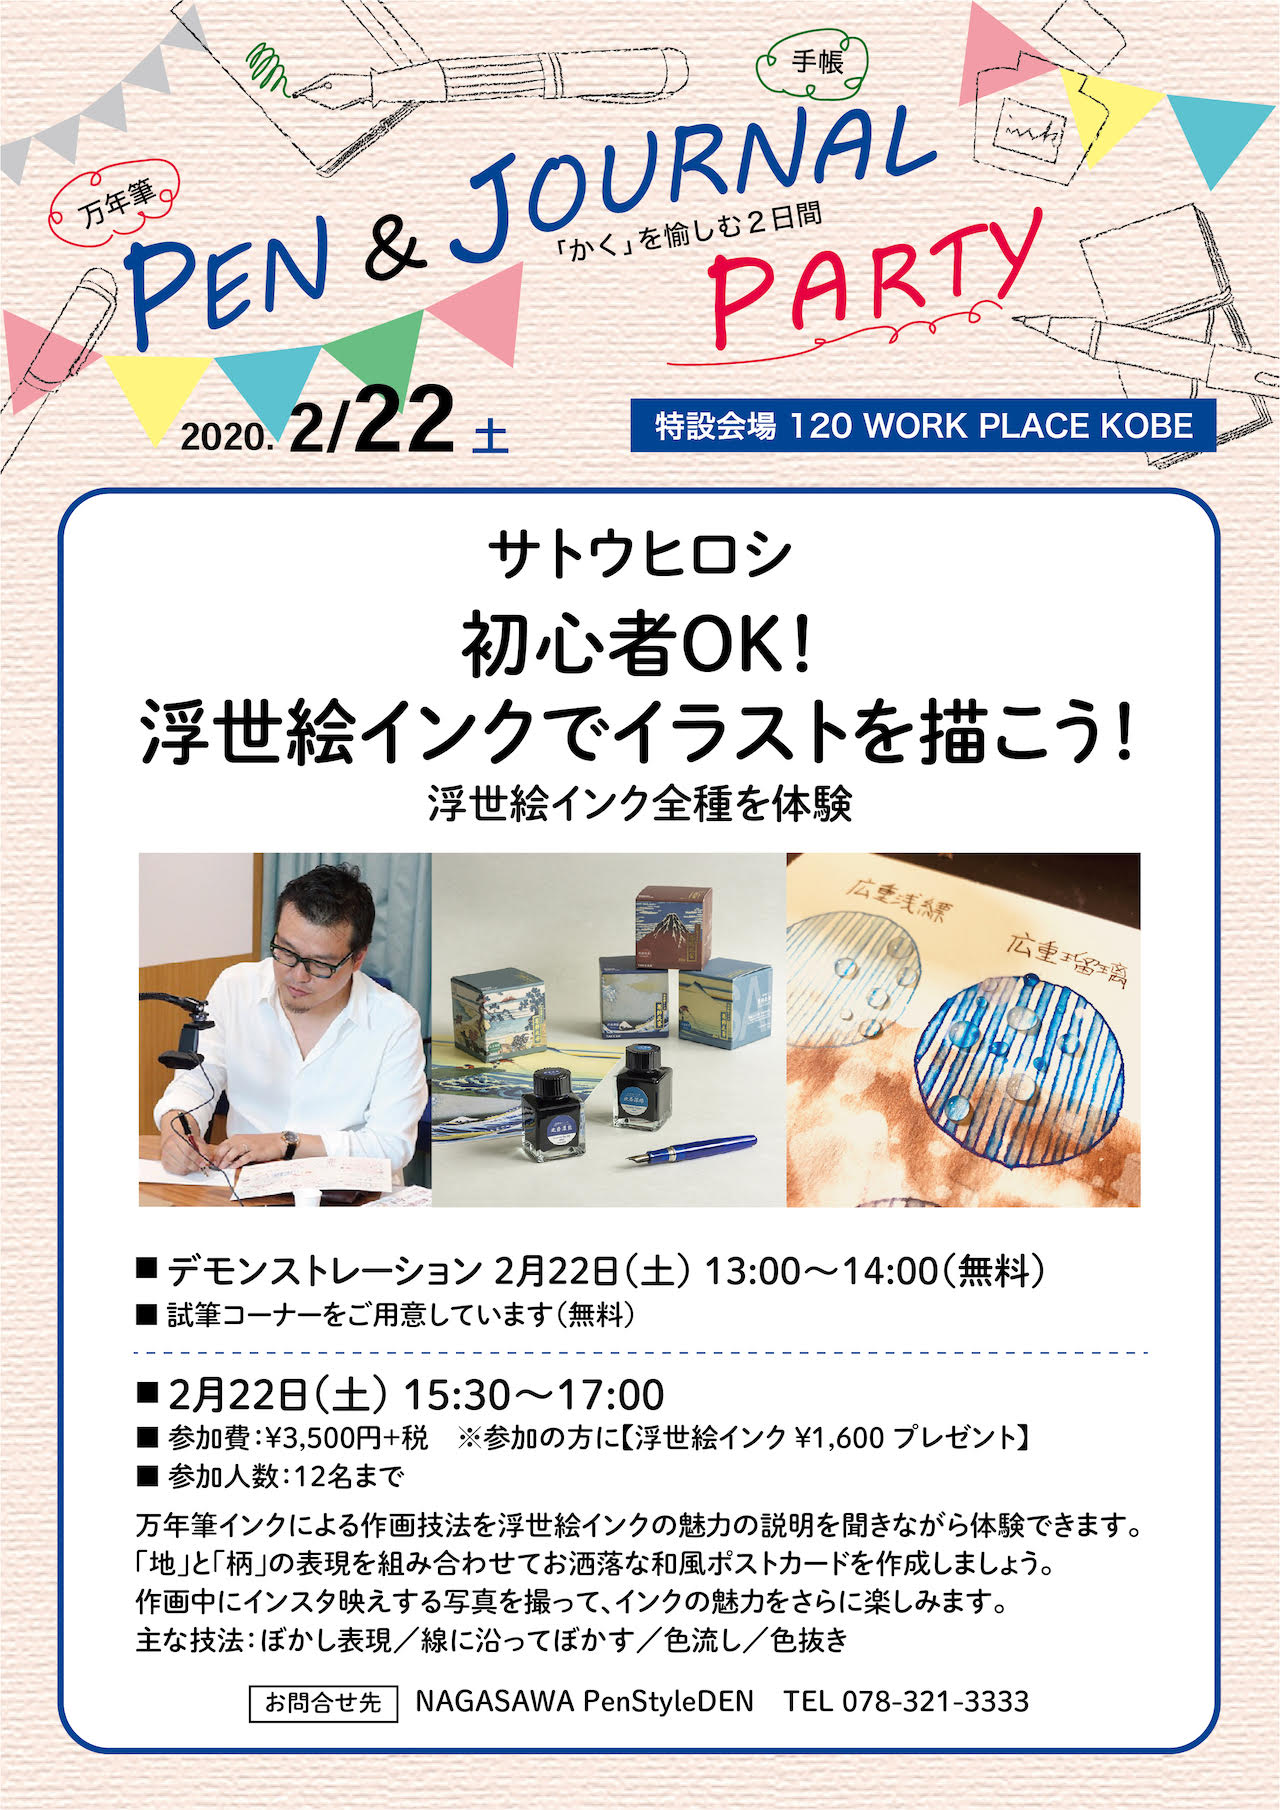 【PenStyle DEN】万年筆と手帳の祭典『PEN & JOURNAL PARTY』を開催!